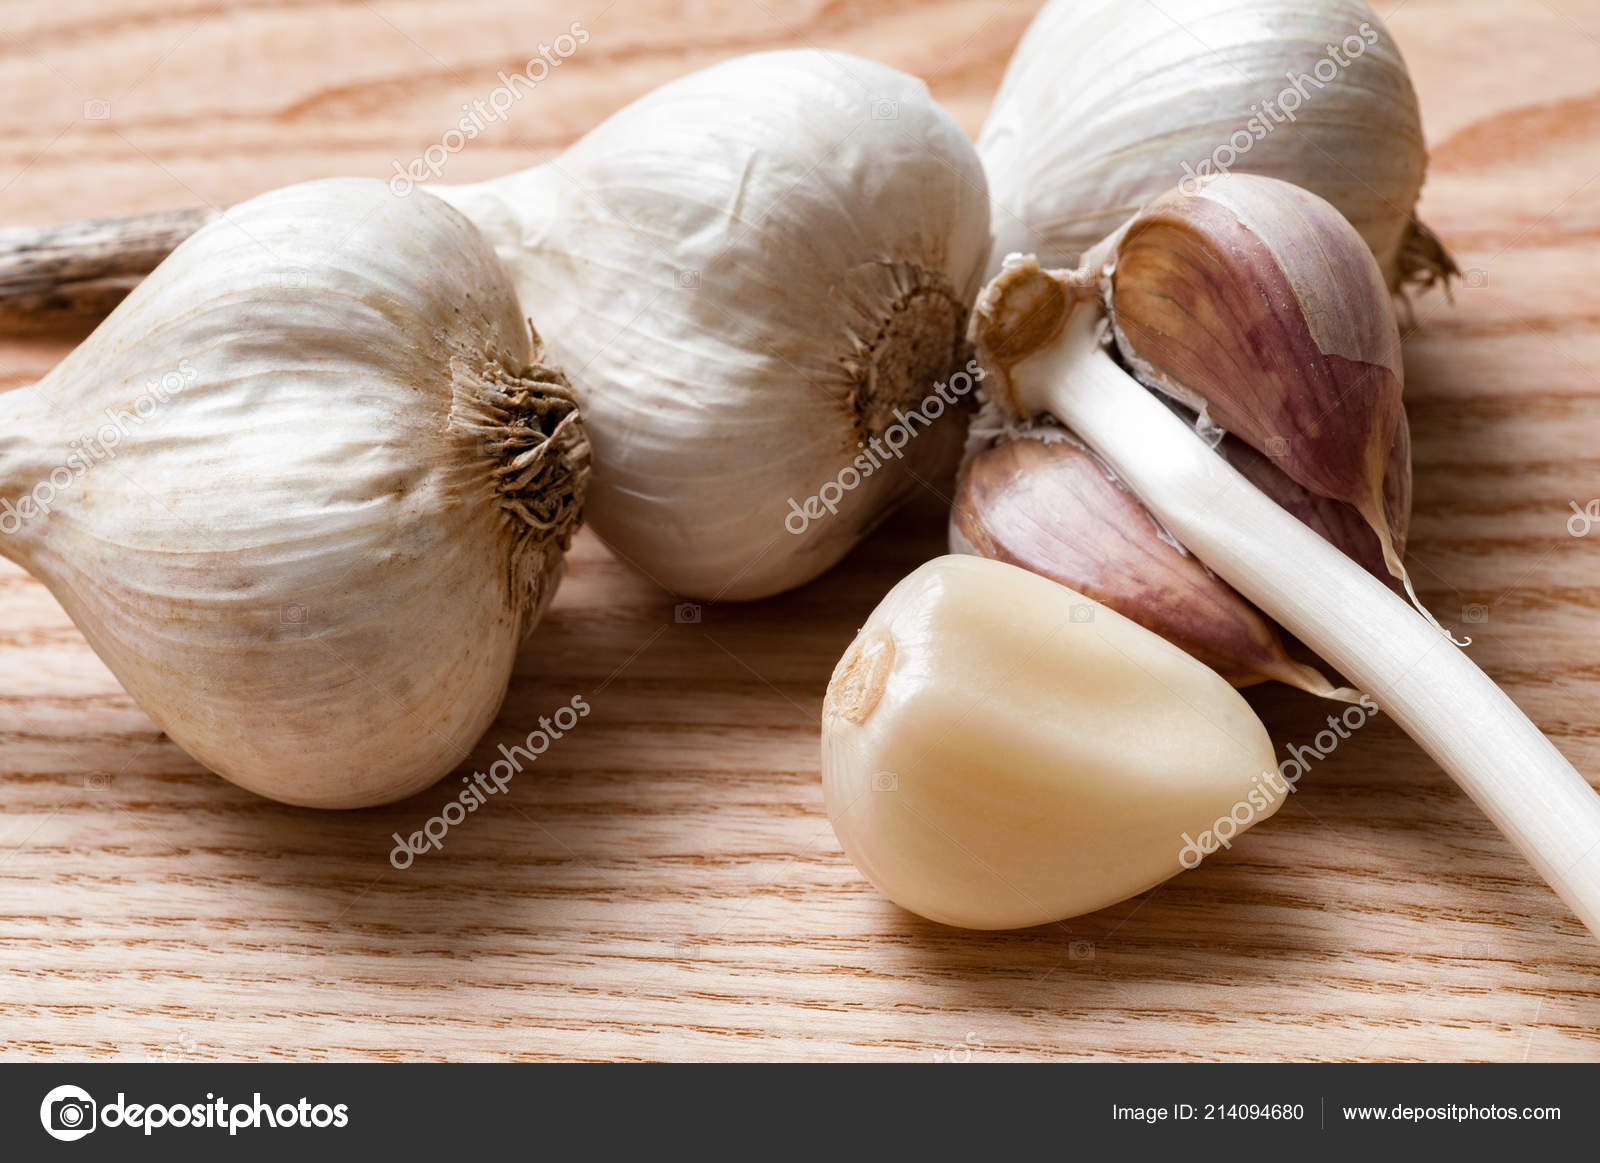 Garlic Head One Peeled Clove Garlic Close Wooden Background Stock Photo C Sasapanchenko Gmail Com 214094680